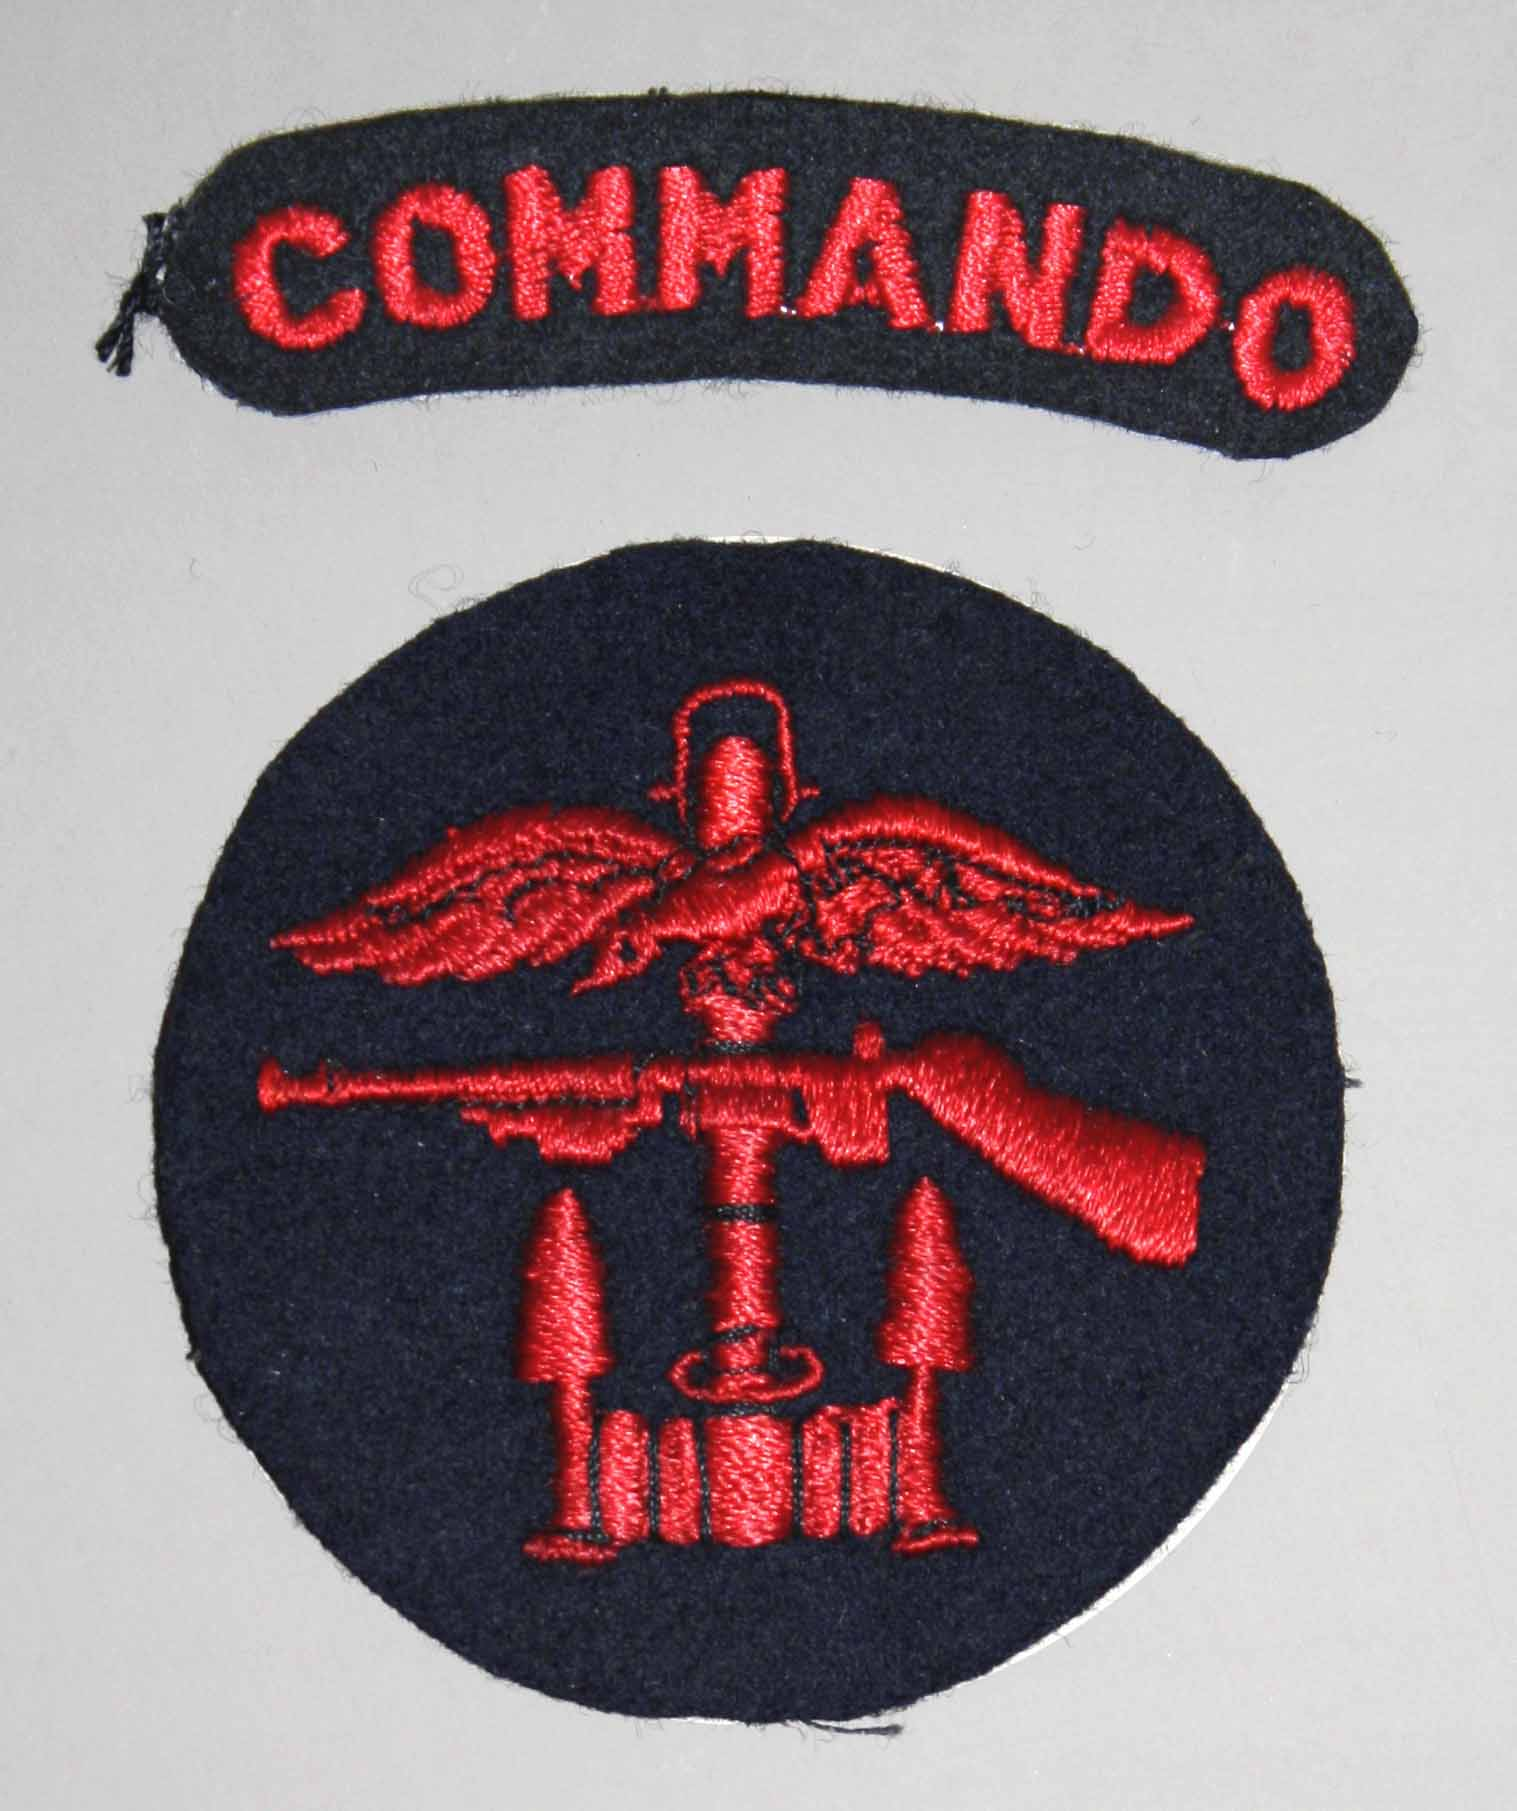 Mundur polskiego komandosa